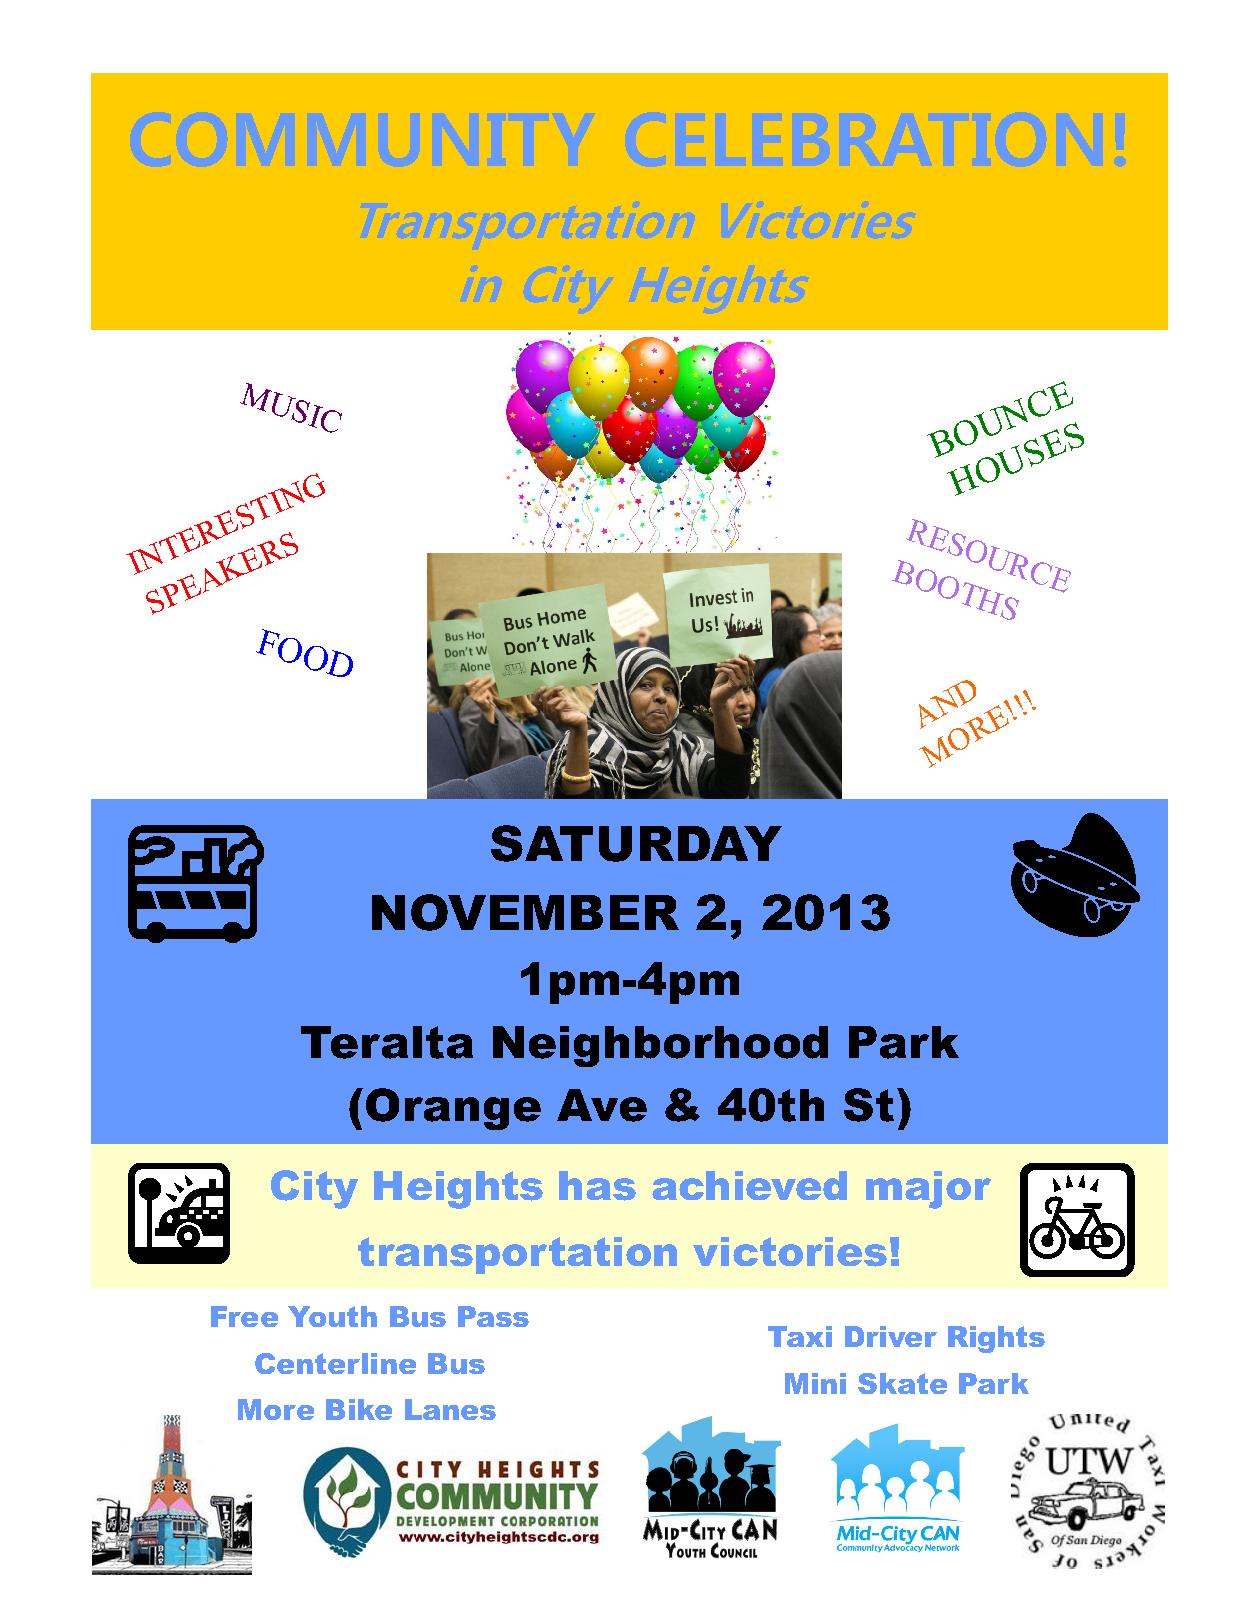 Community Celebration Flyer